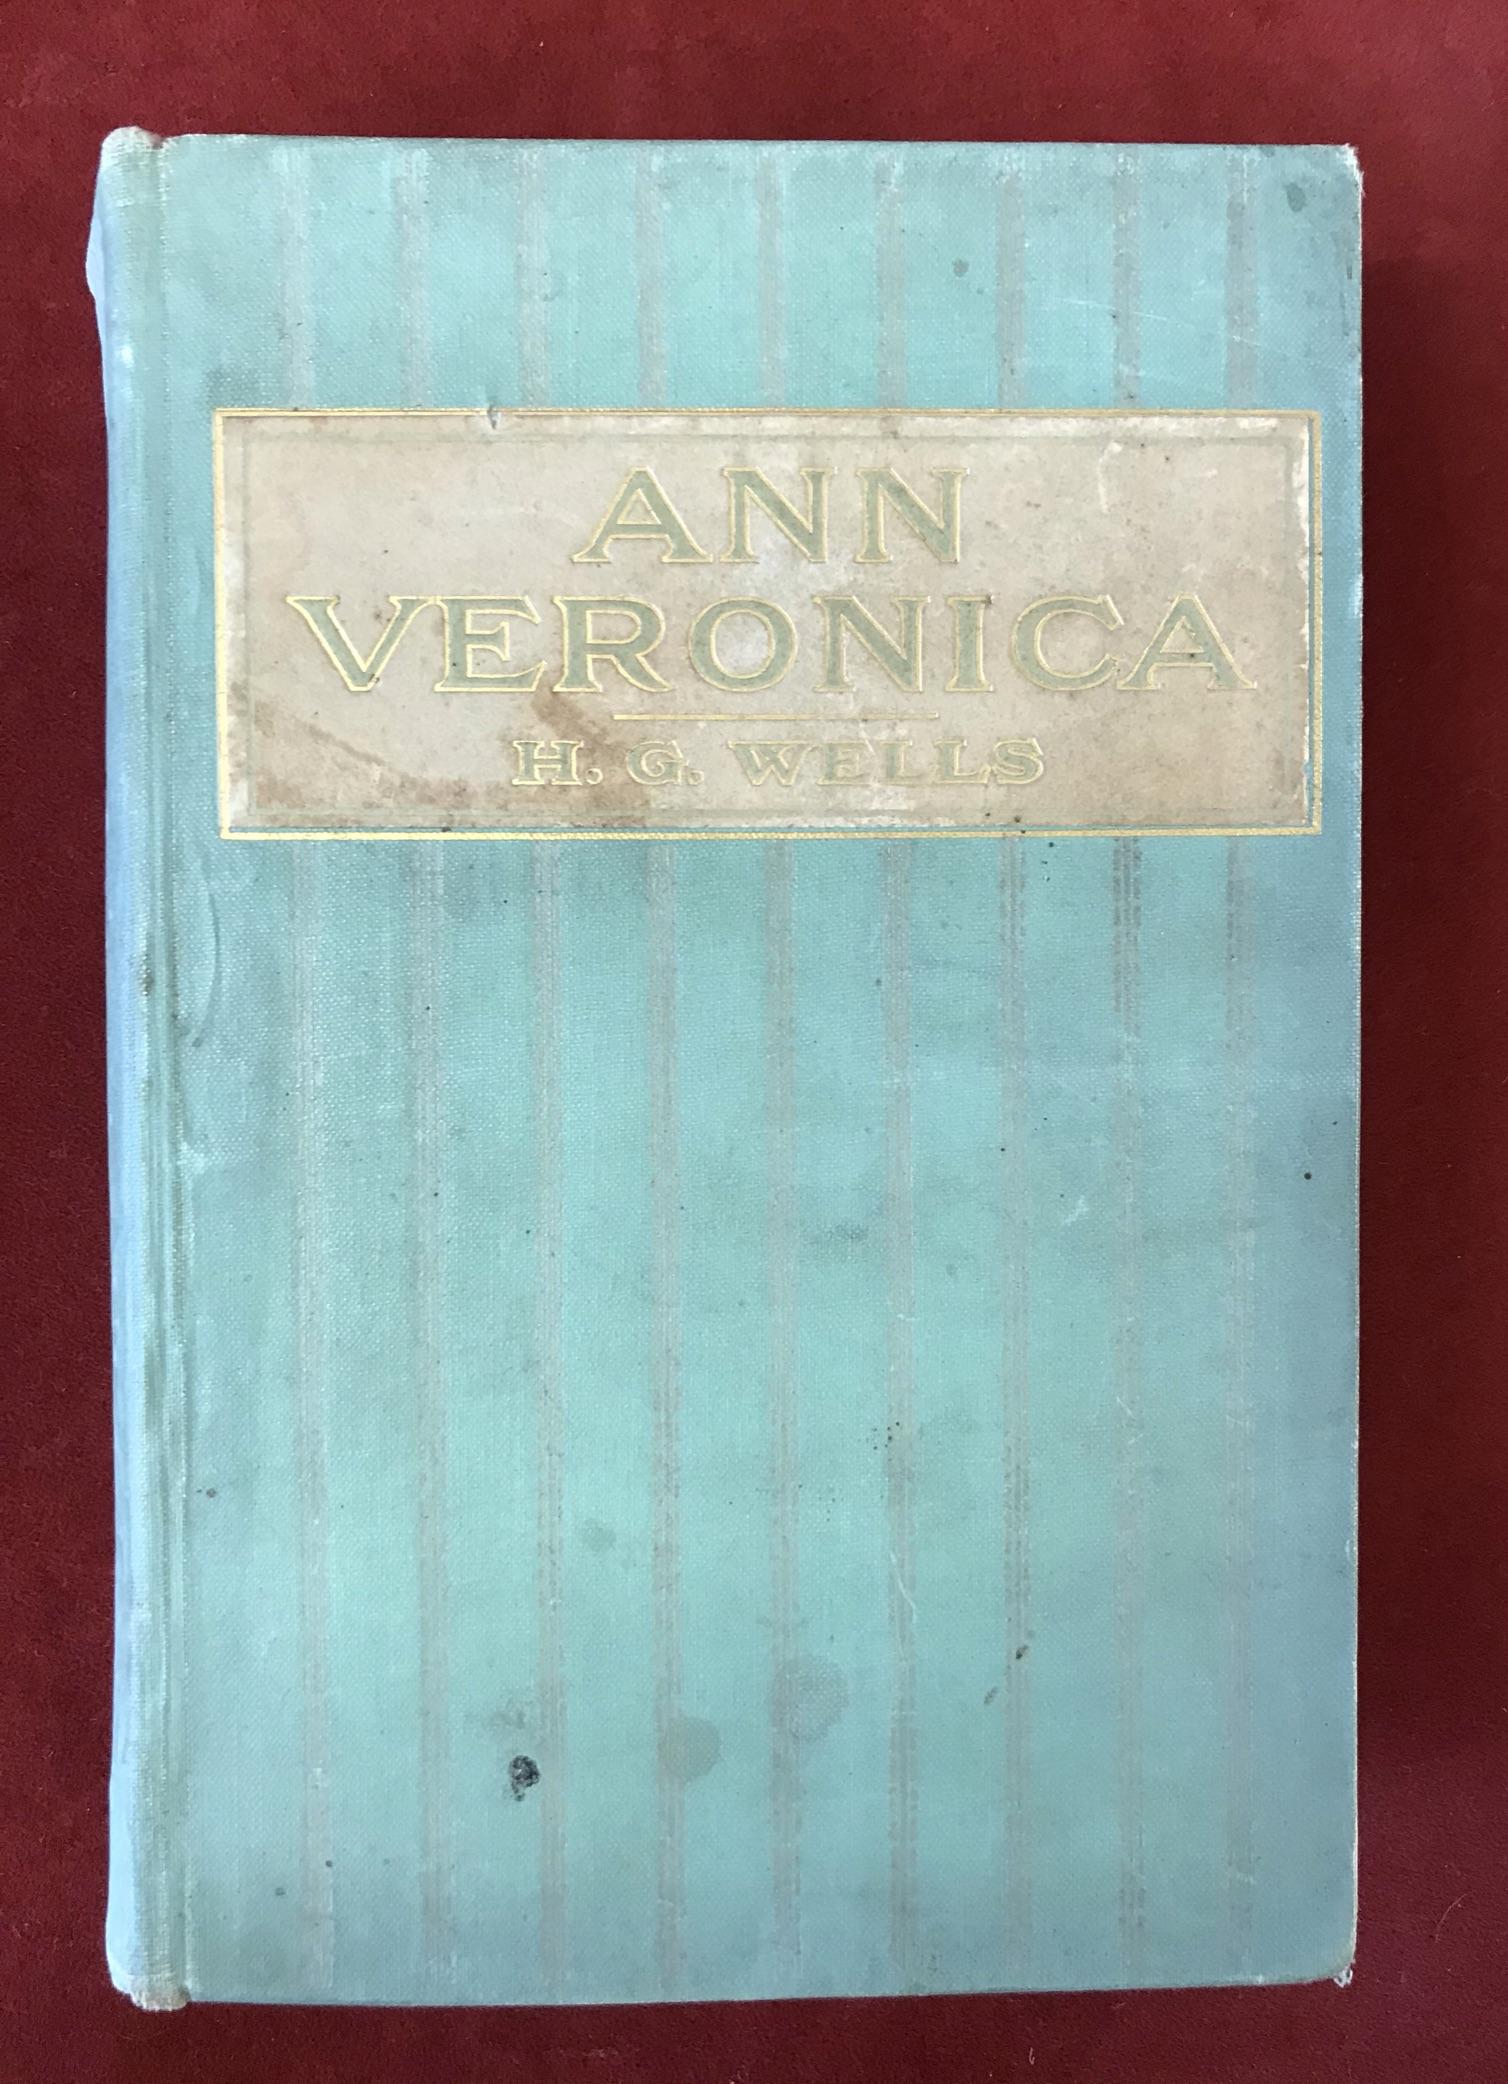 Ann VeronicaFirst U.S. edition, 1909